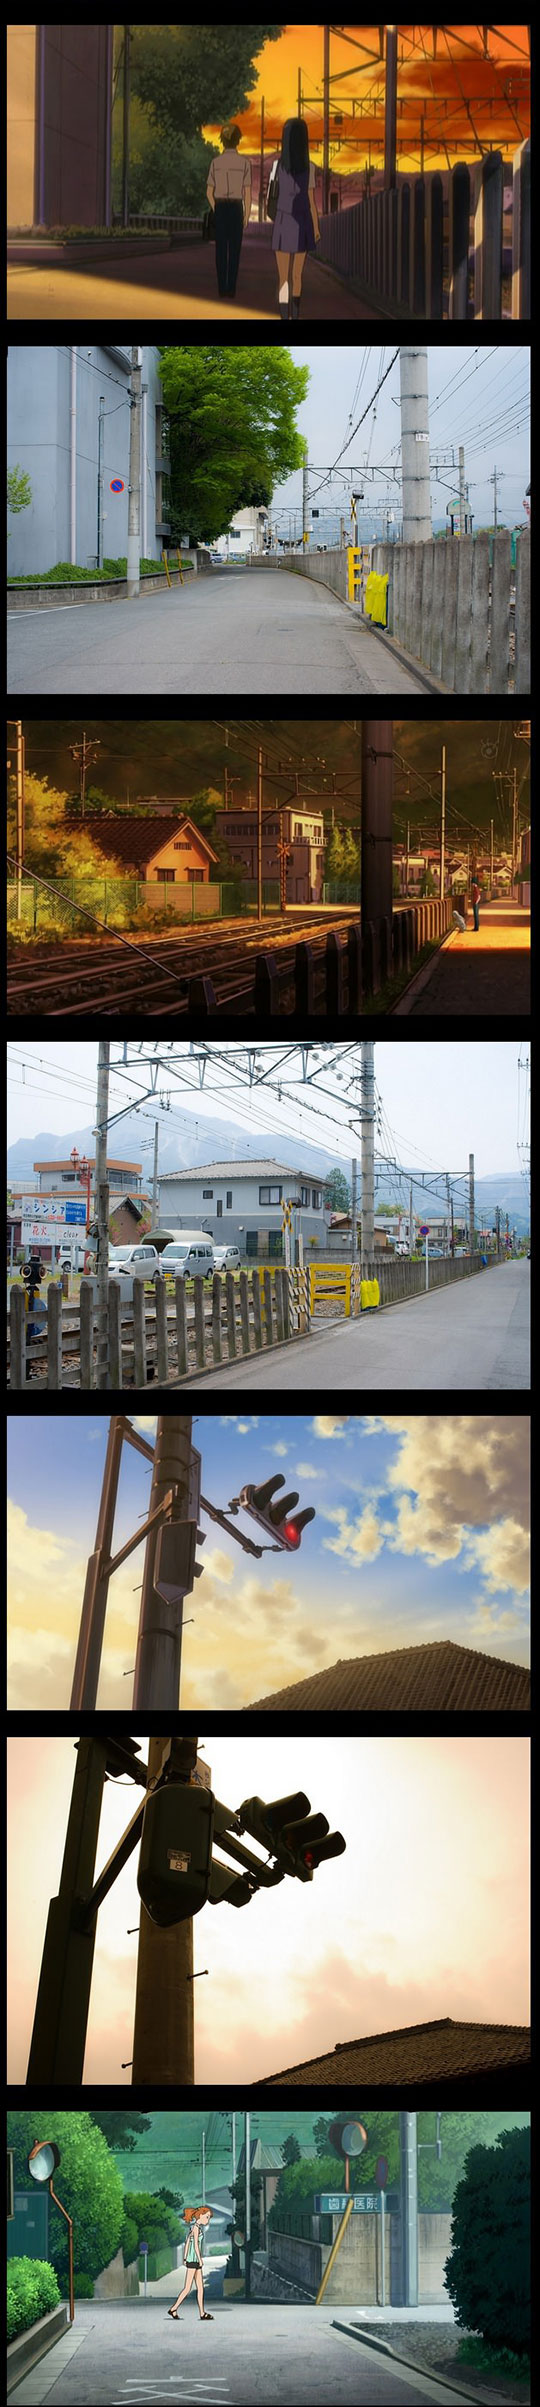 cool-anime-vs-real-life-places-city-bridge